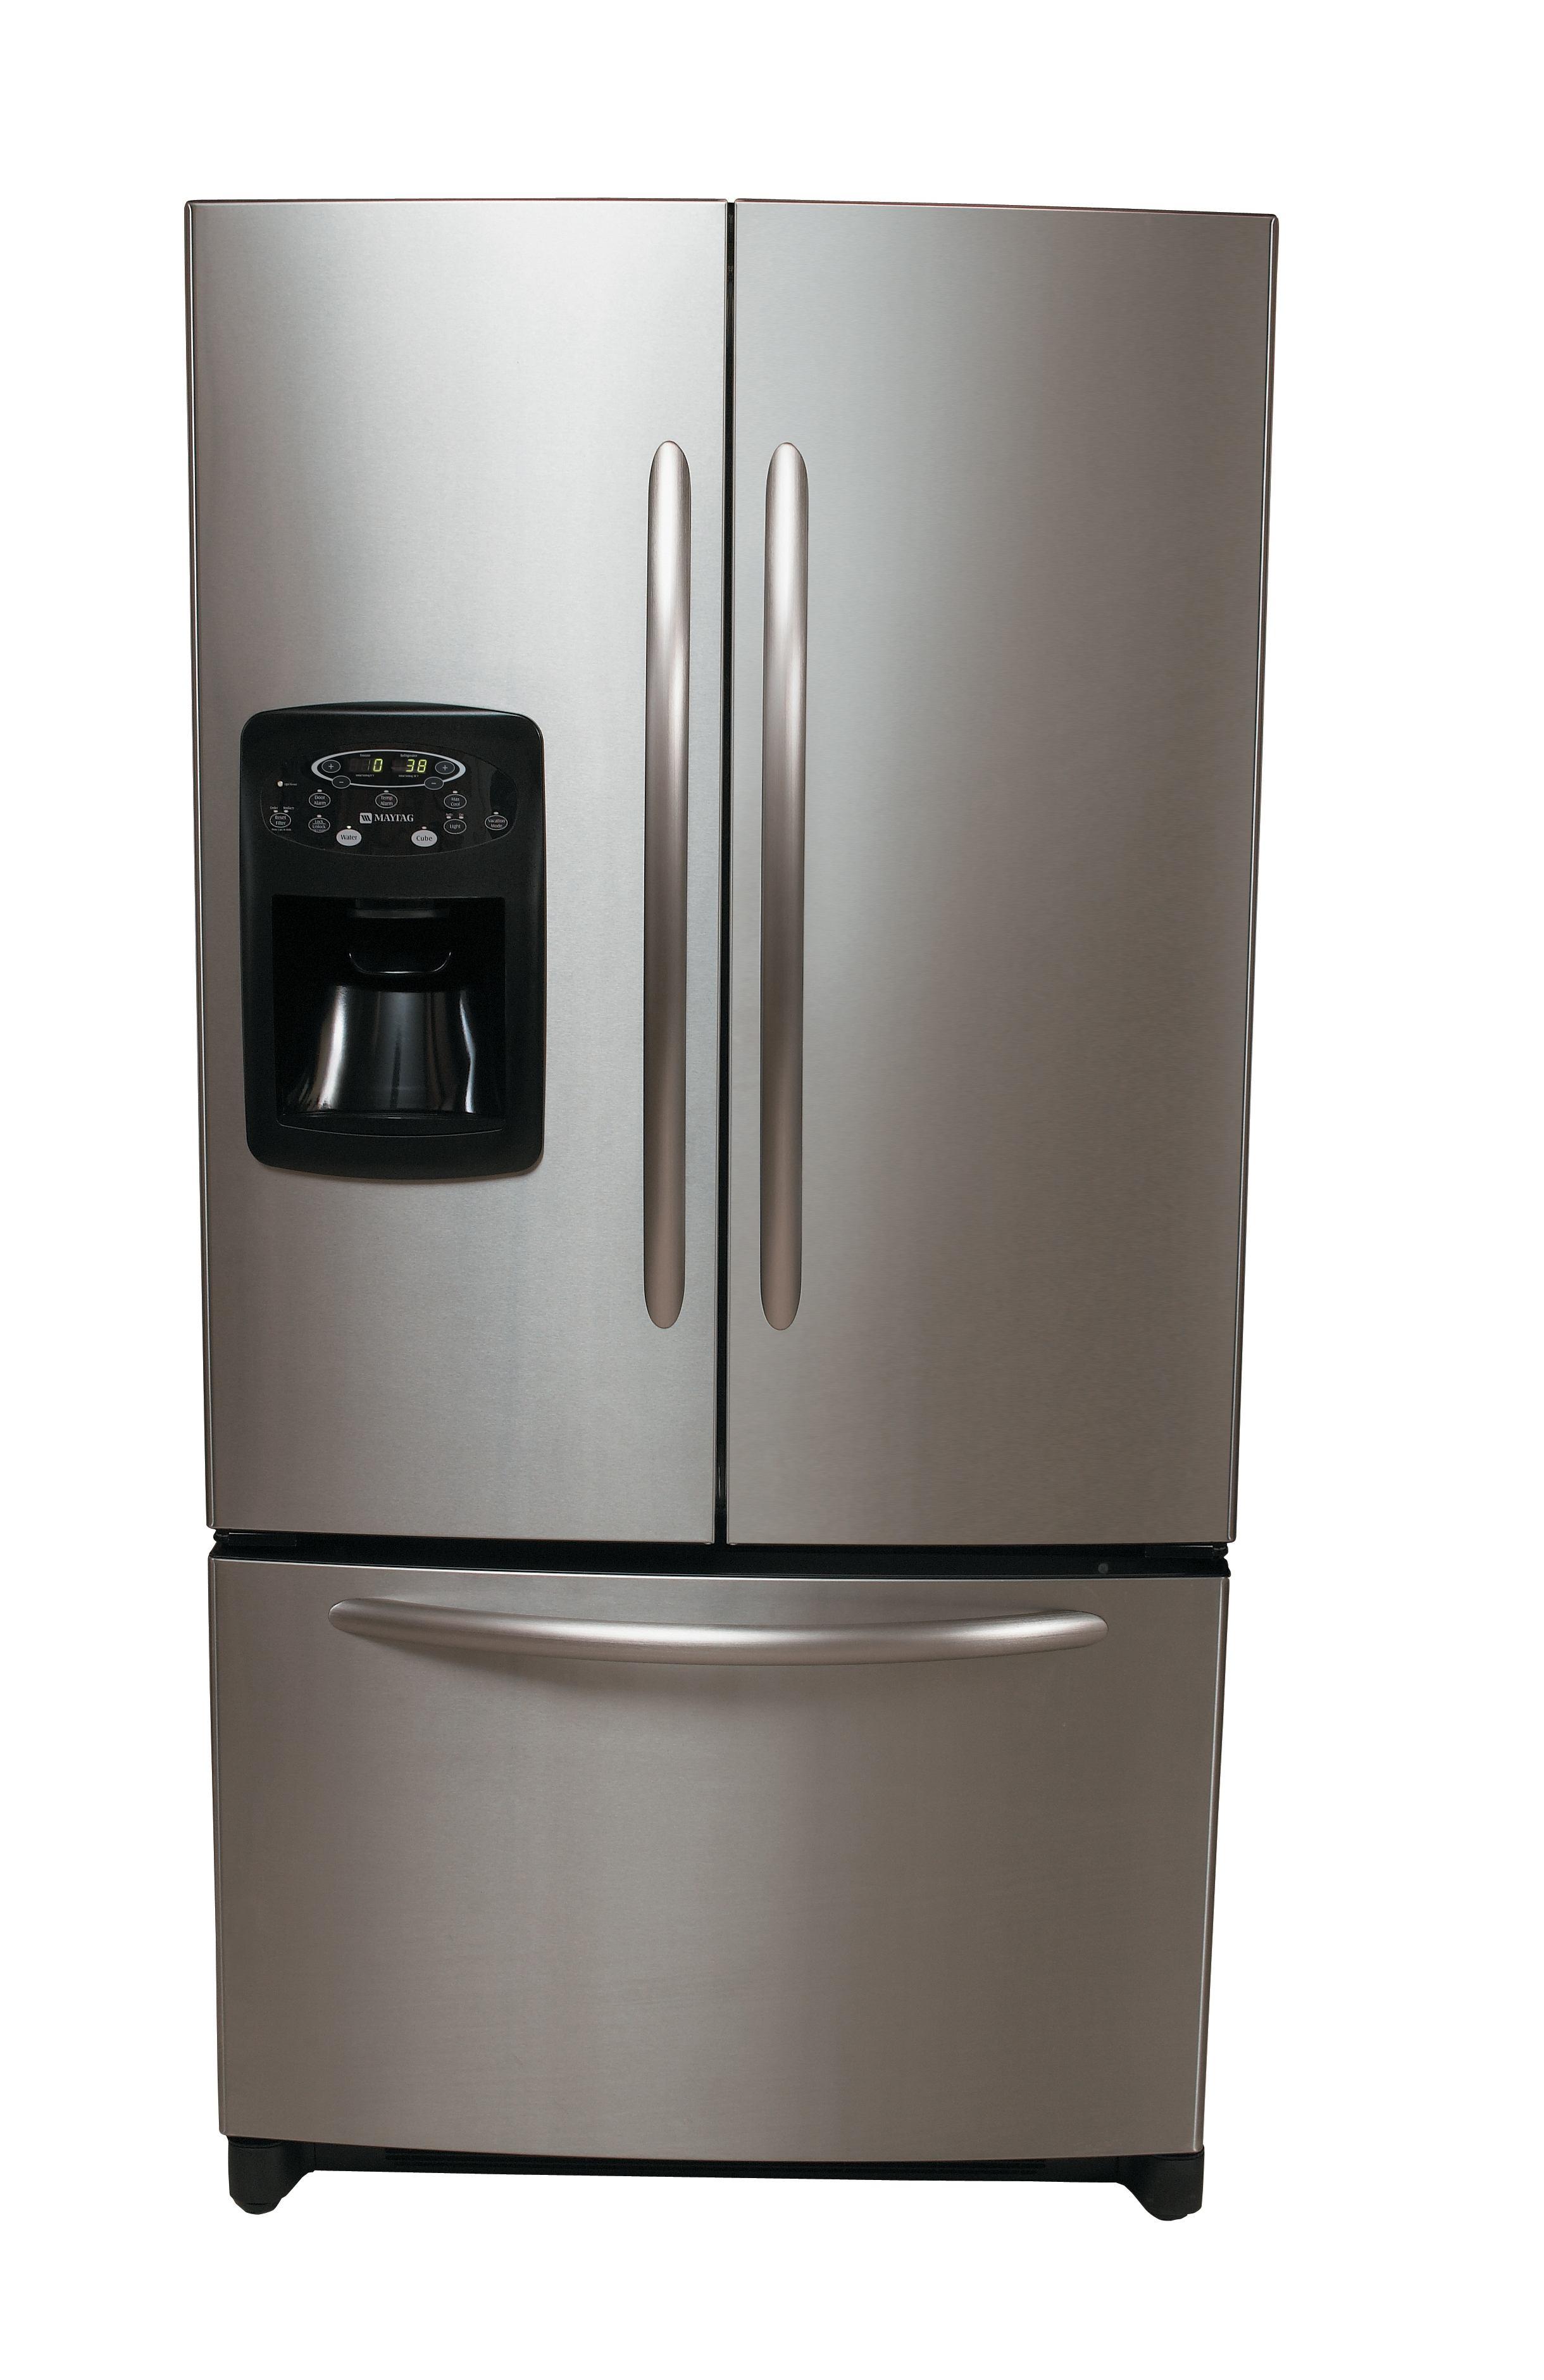 Ice2o Refrigerator By Maytag Builder Magazine Tools